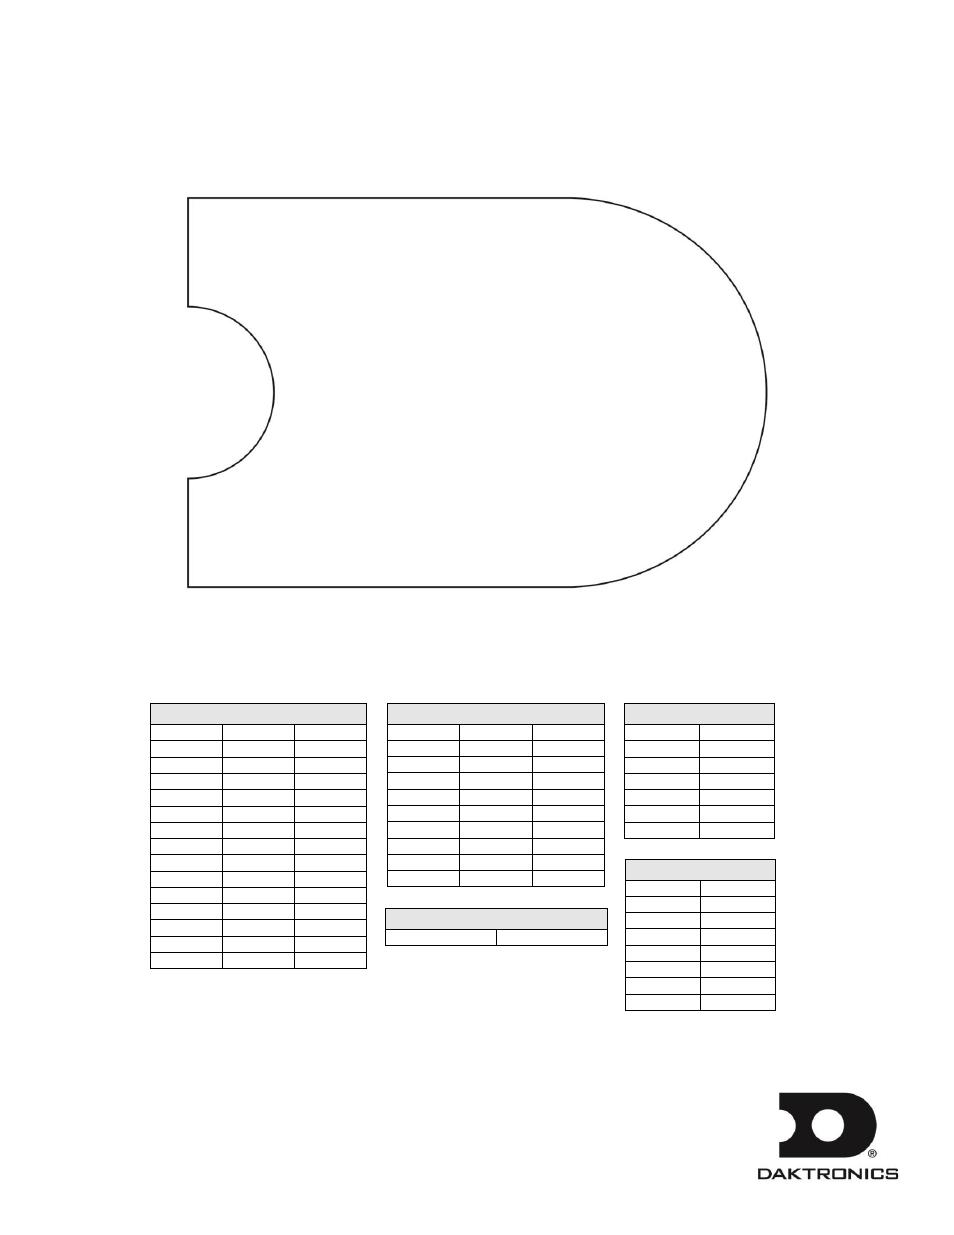 Daktronics Outdoor LED Scoreboards Installation User Manual